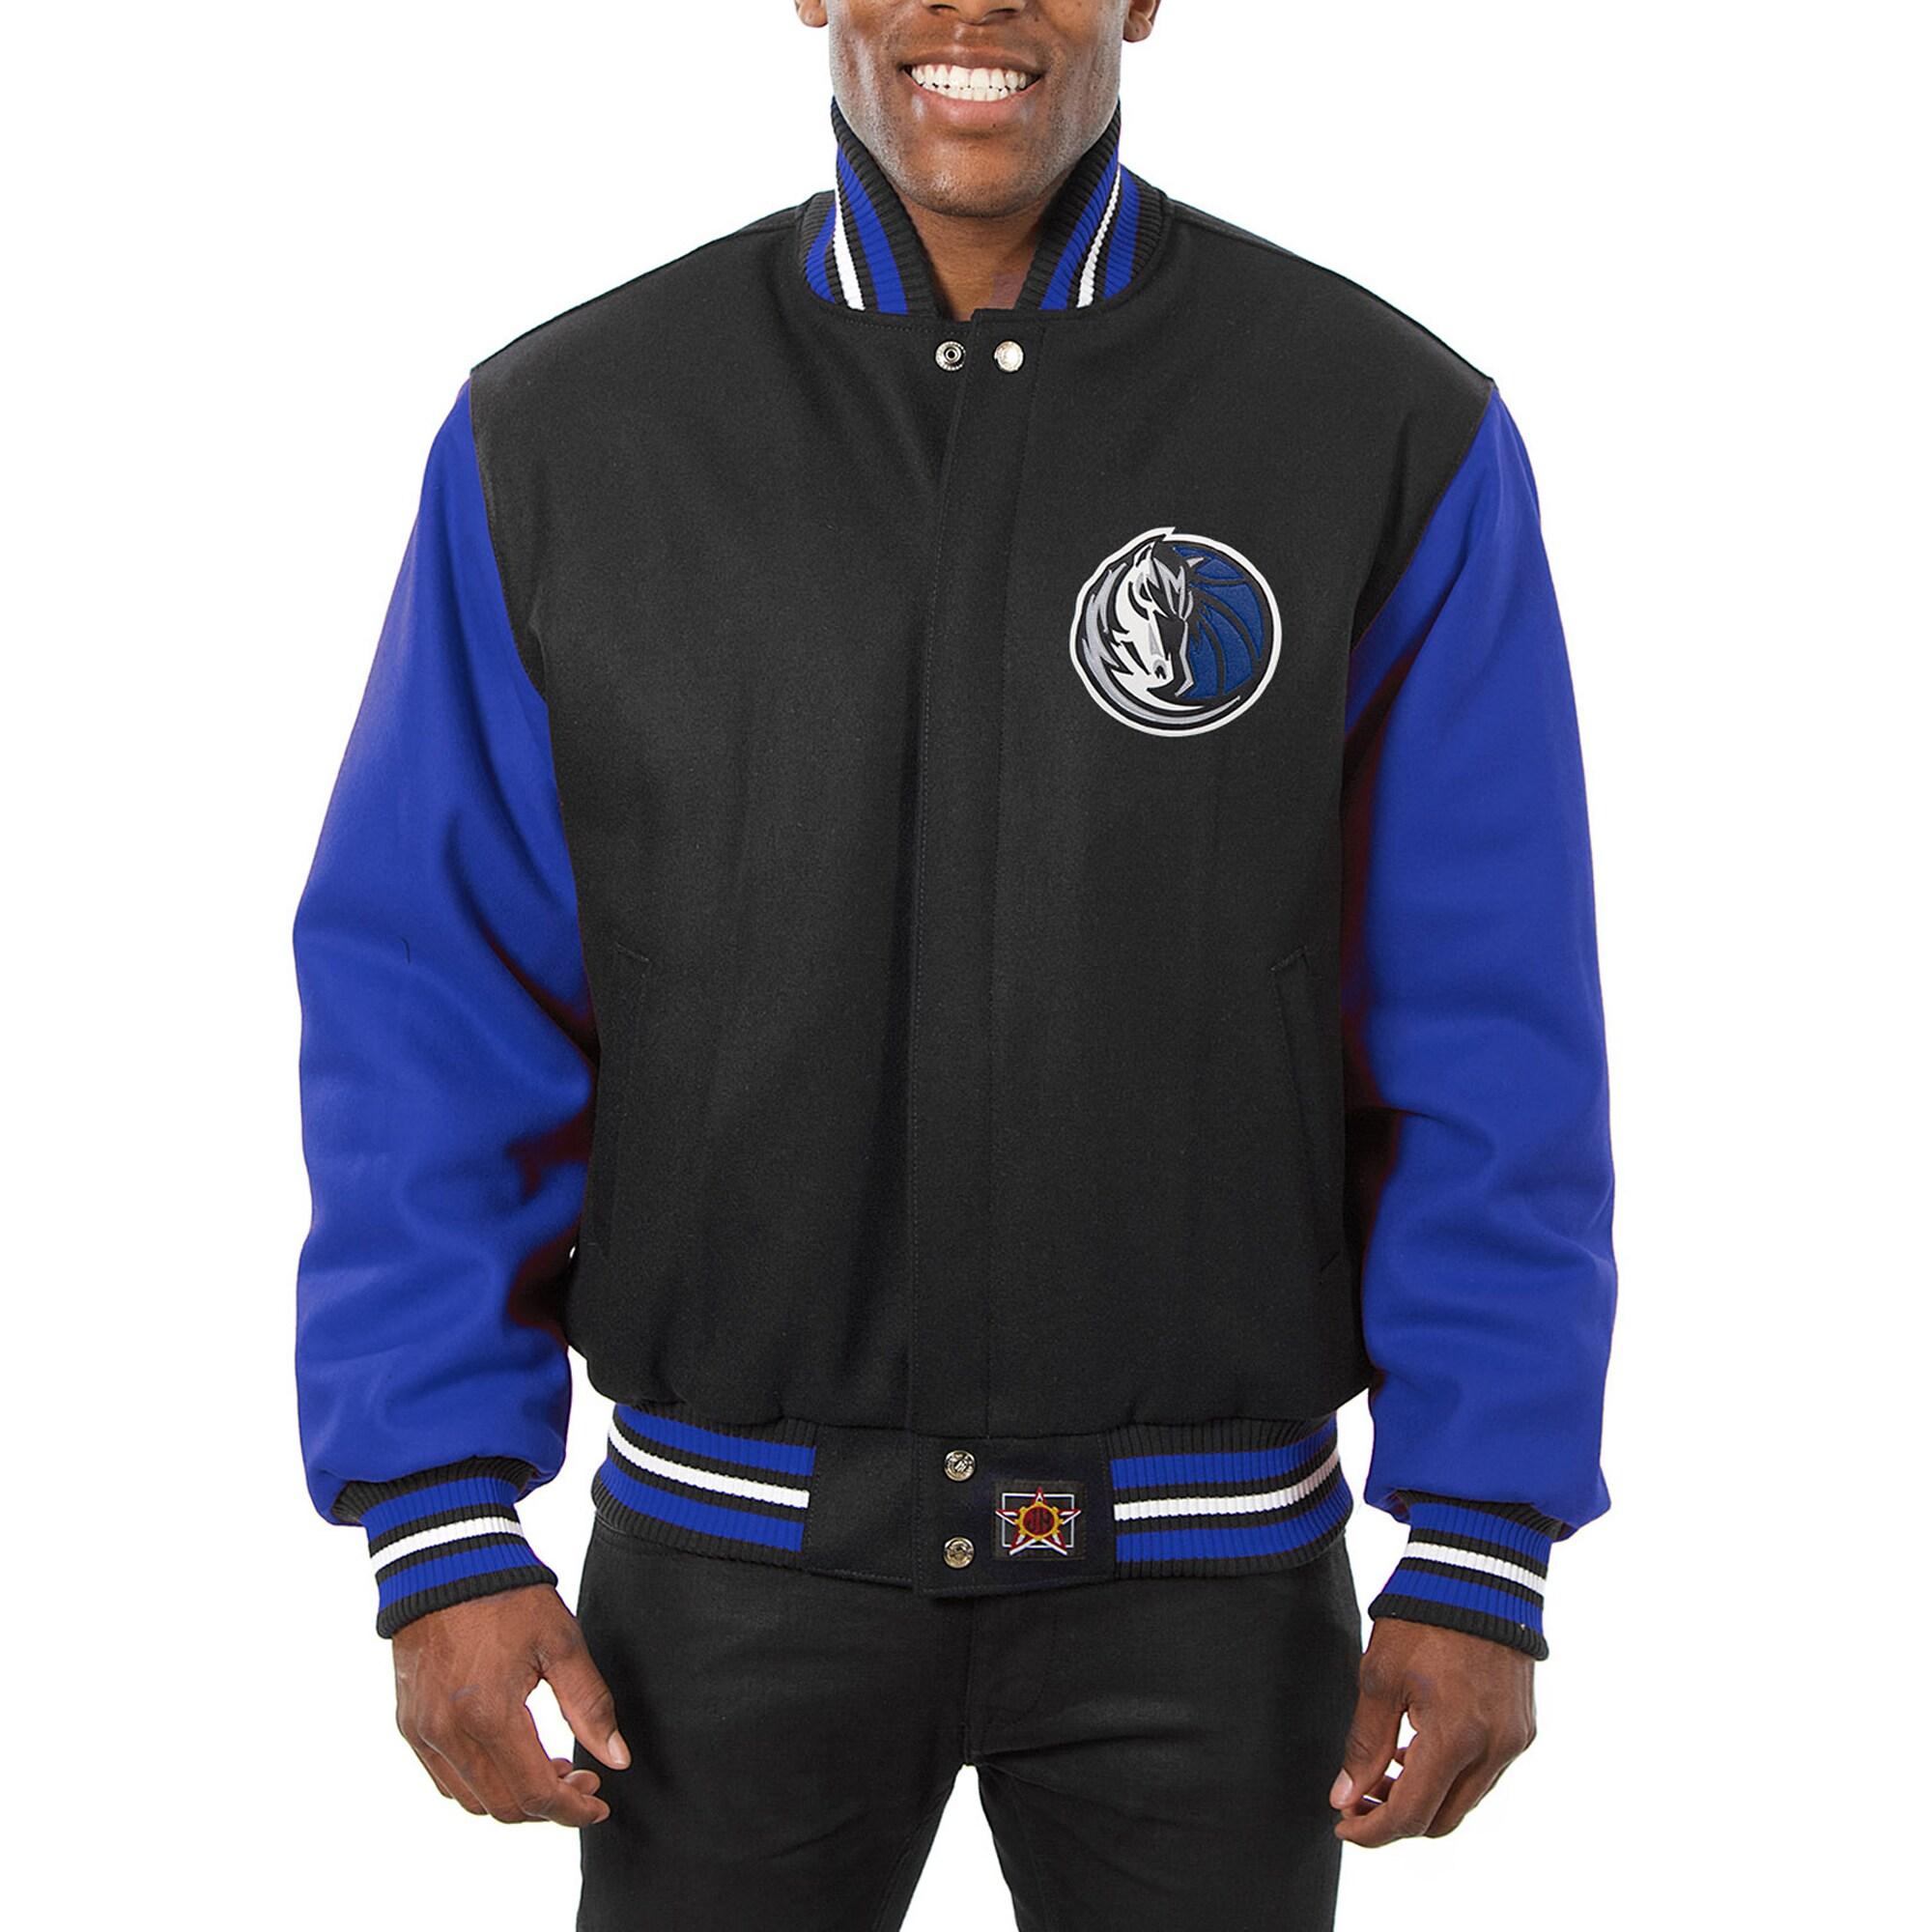 Dallas Mavericks JH Design Domestic Two-Tone Wool Jacket - Black